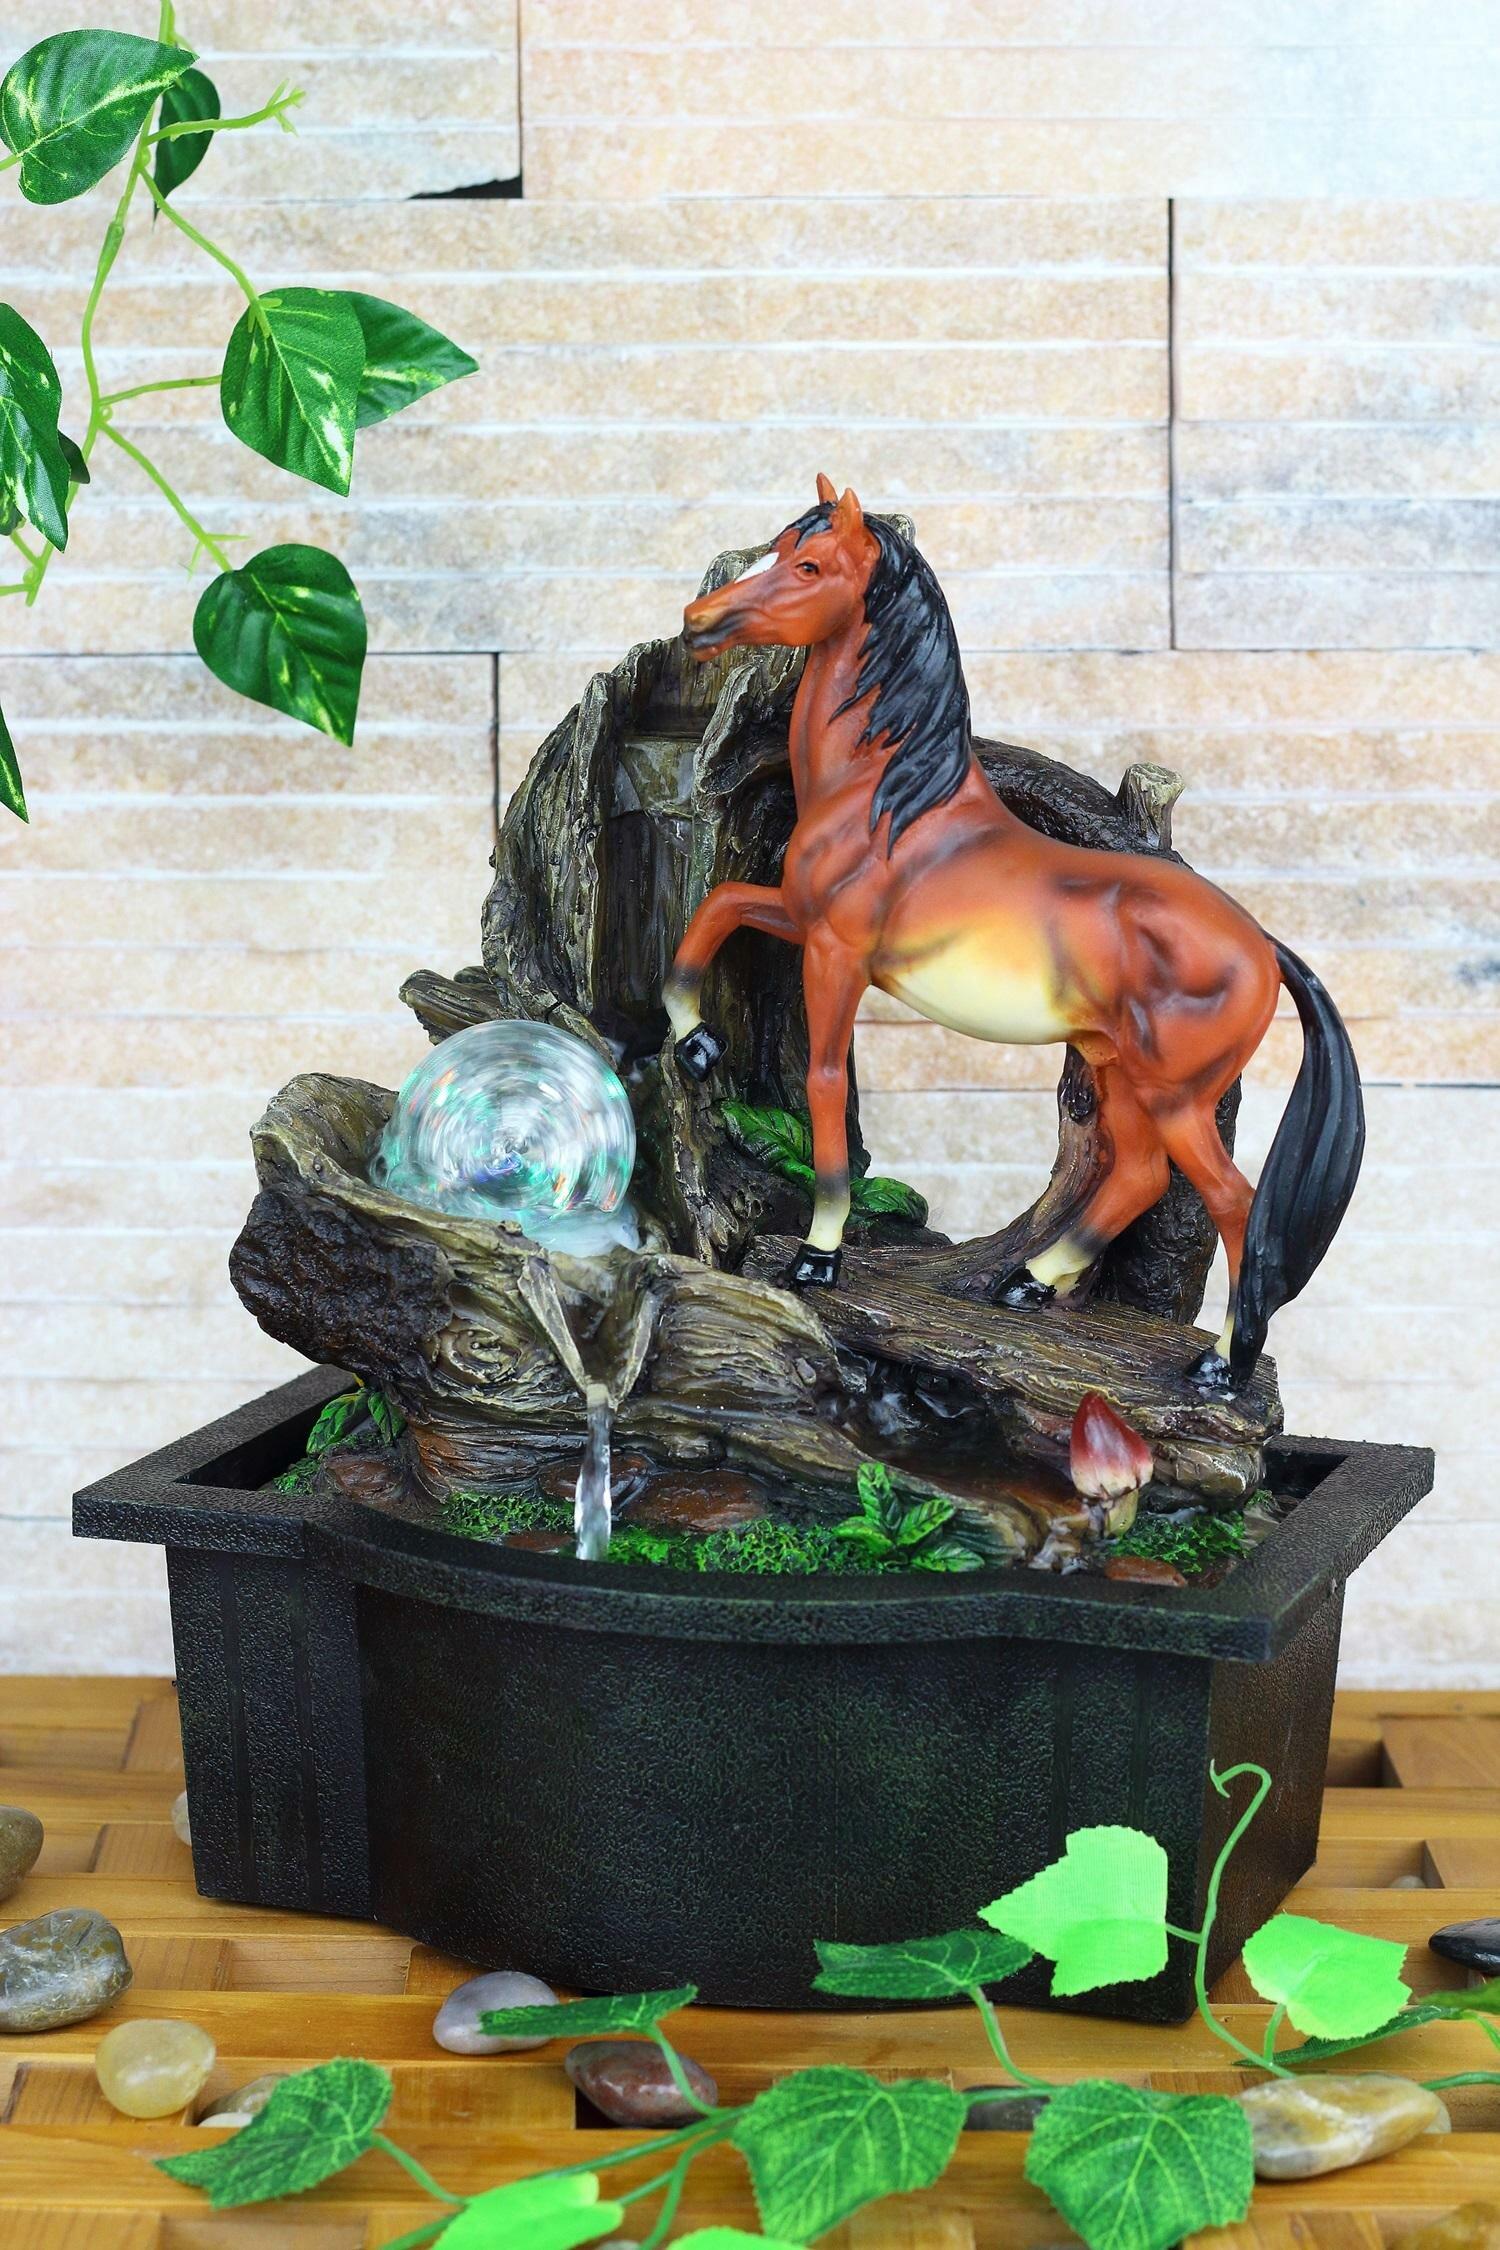 OK Lighting Resin/Fibreglass Horse Table Fountain With LED Light | Wayfair